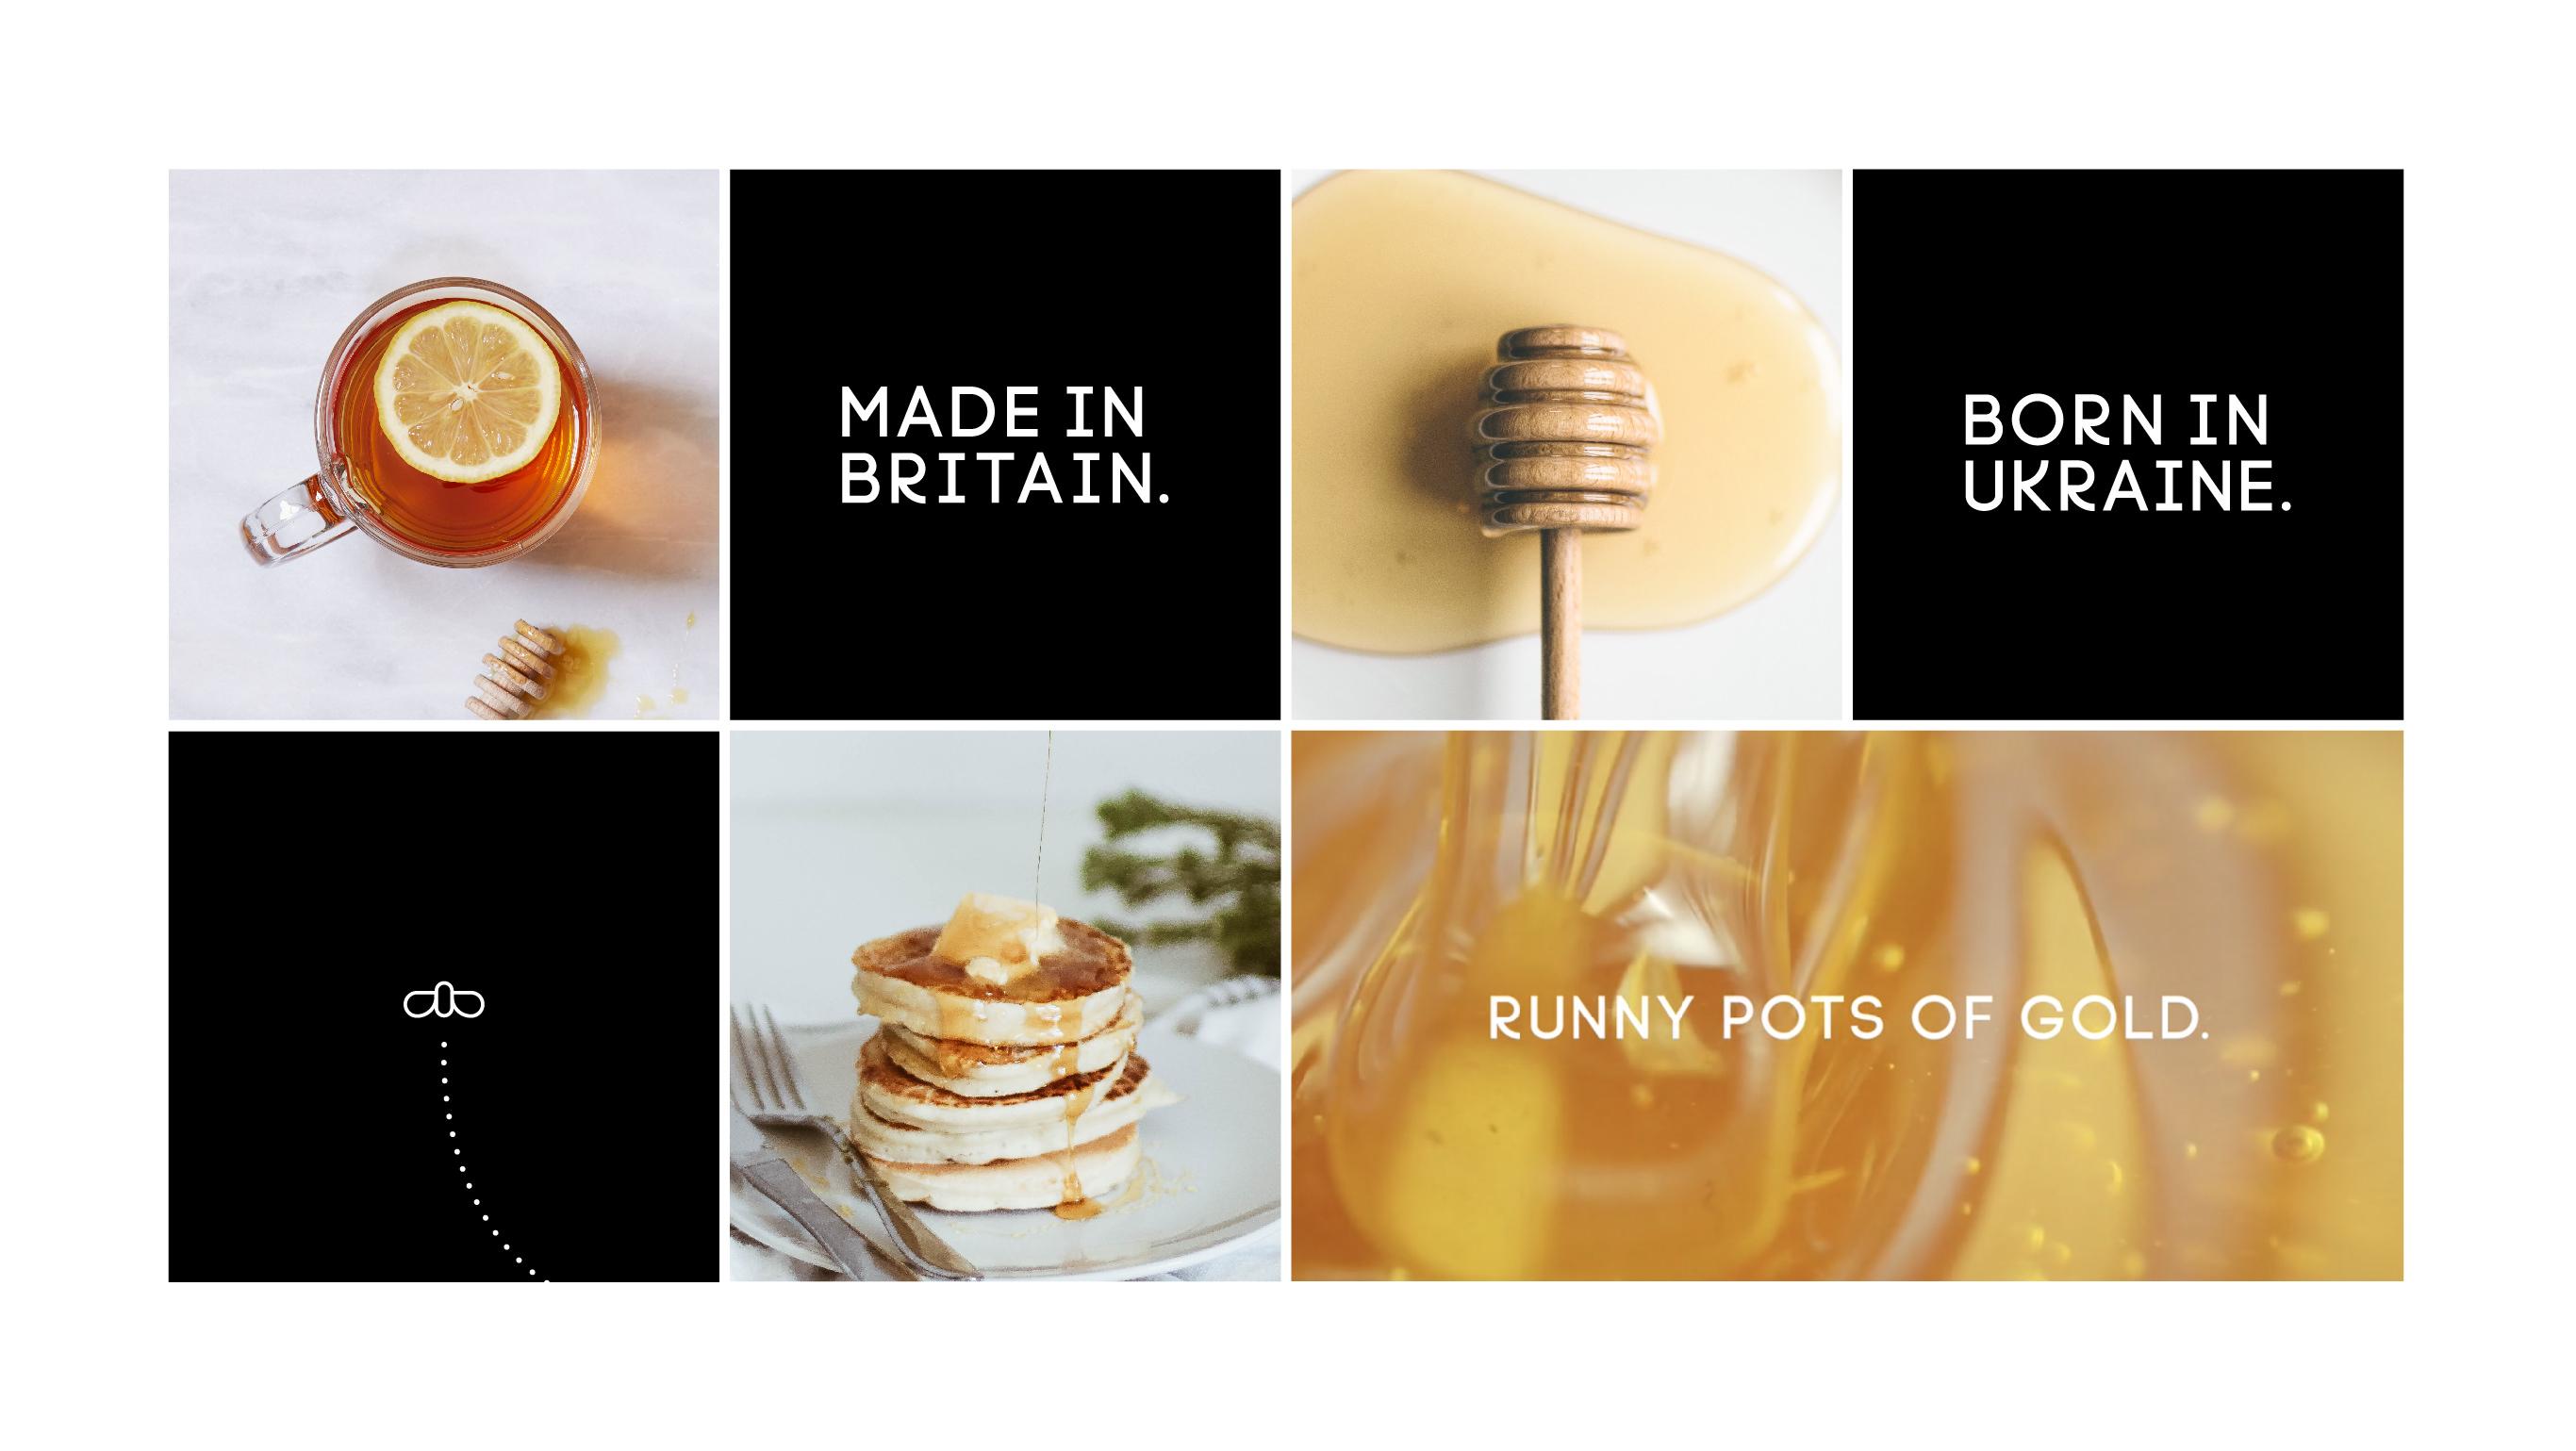 pasika honey social media posts design